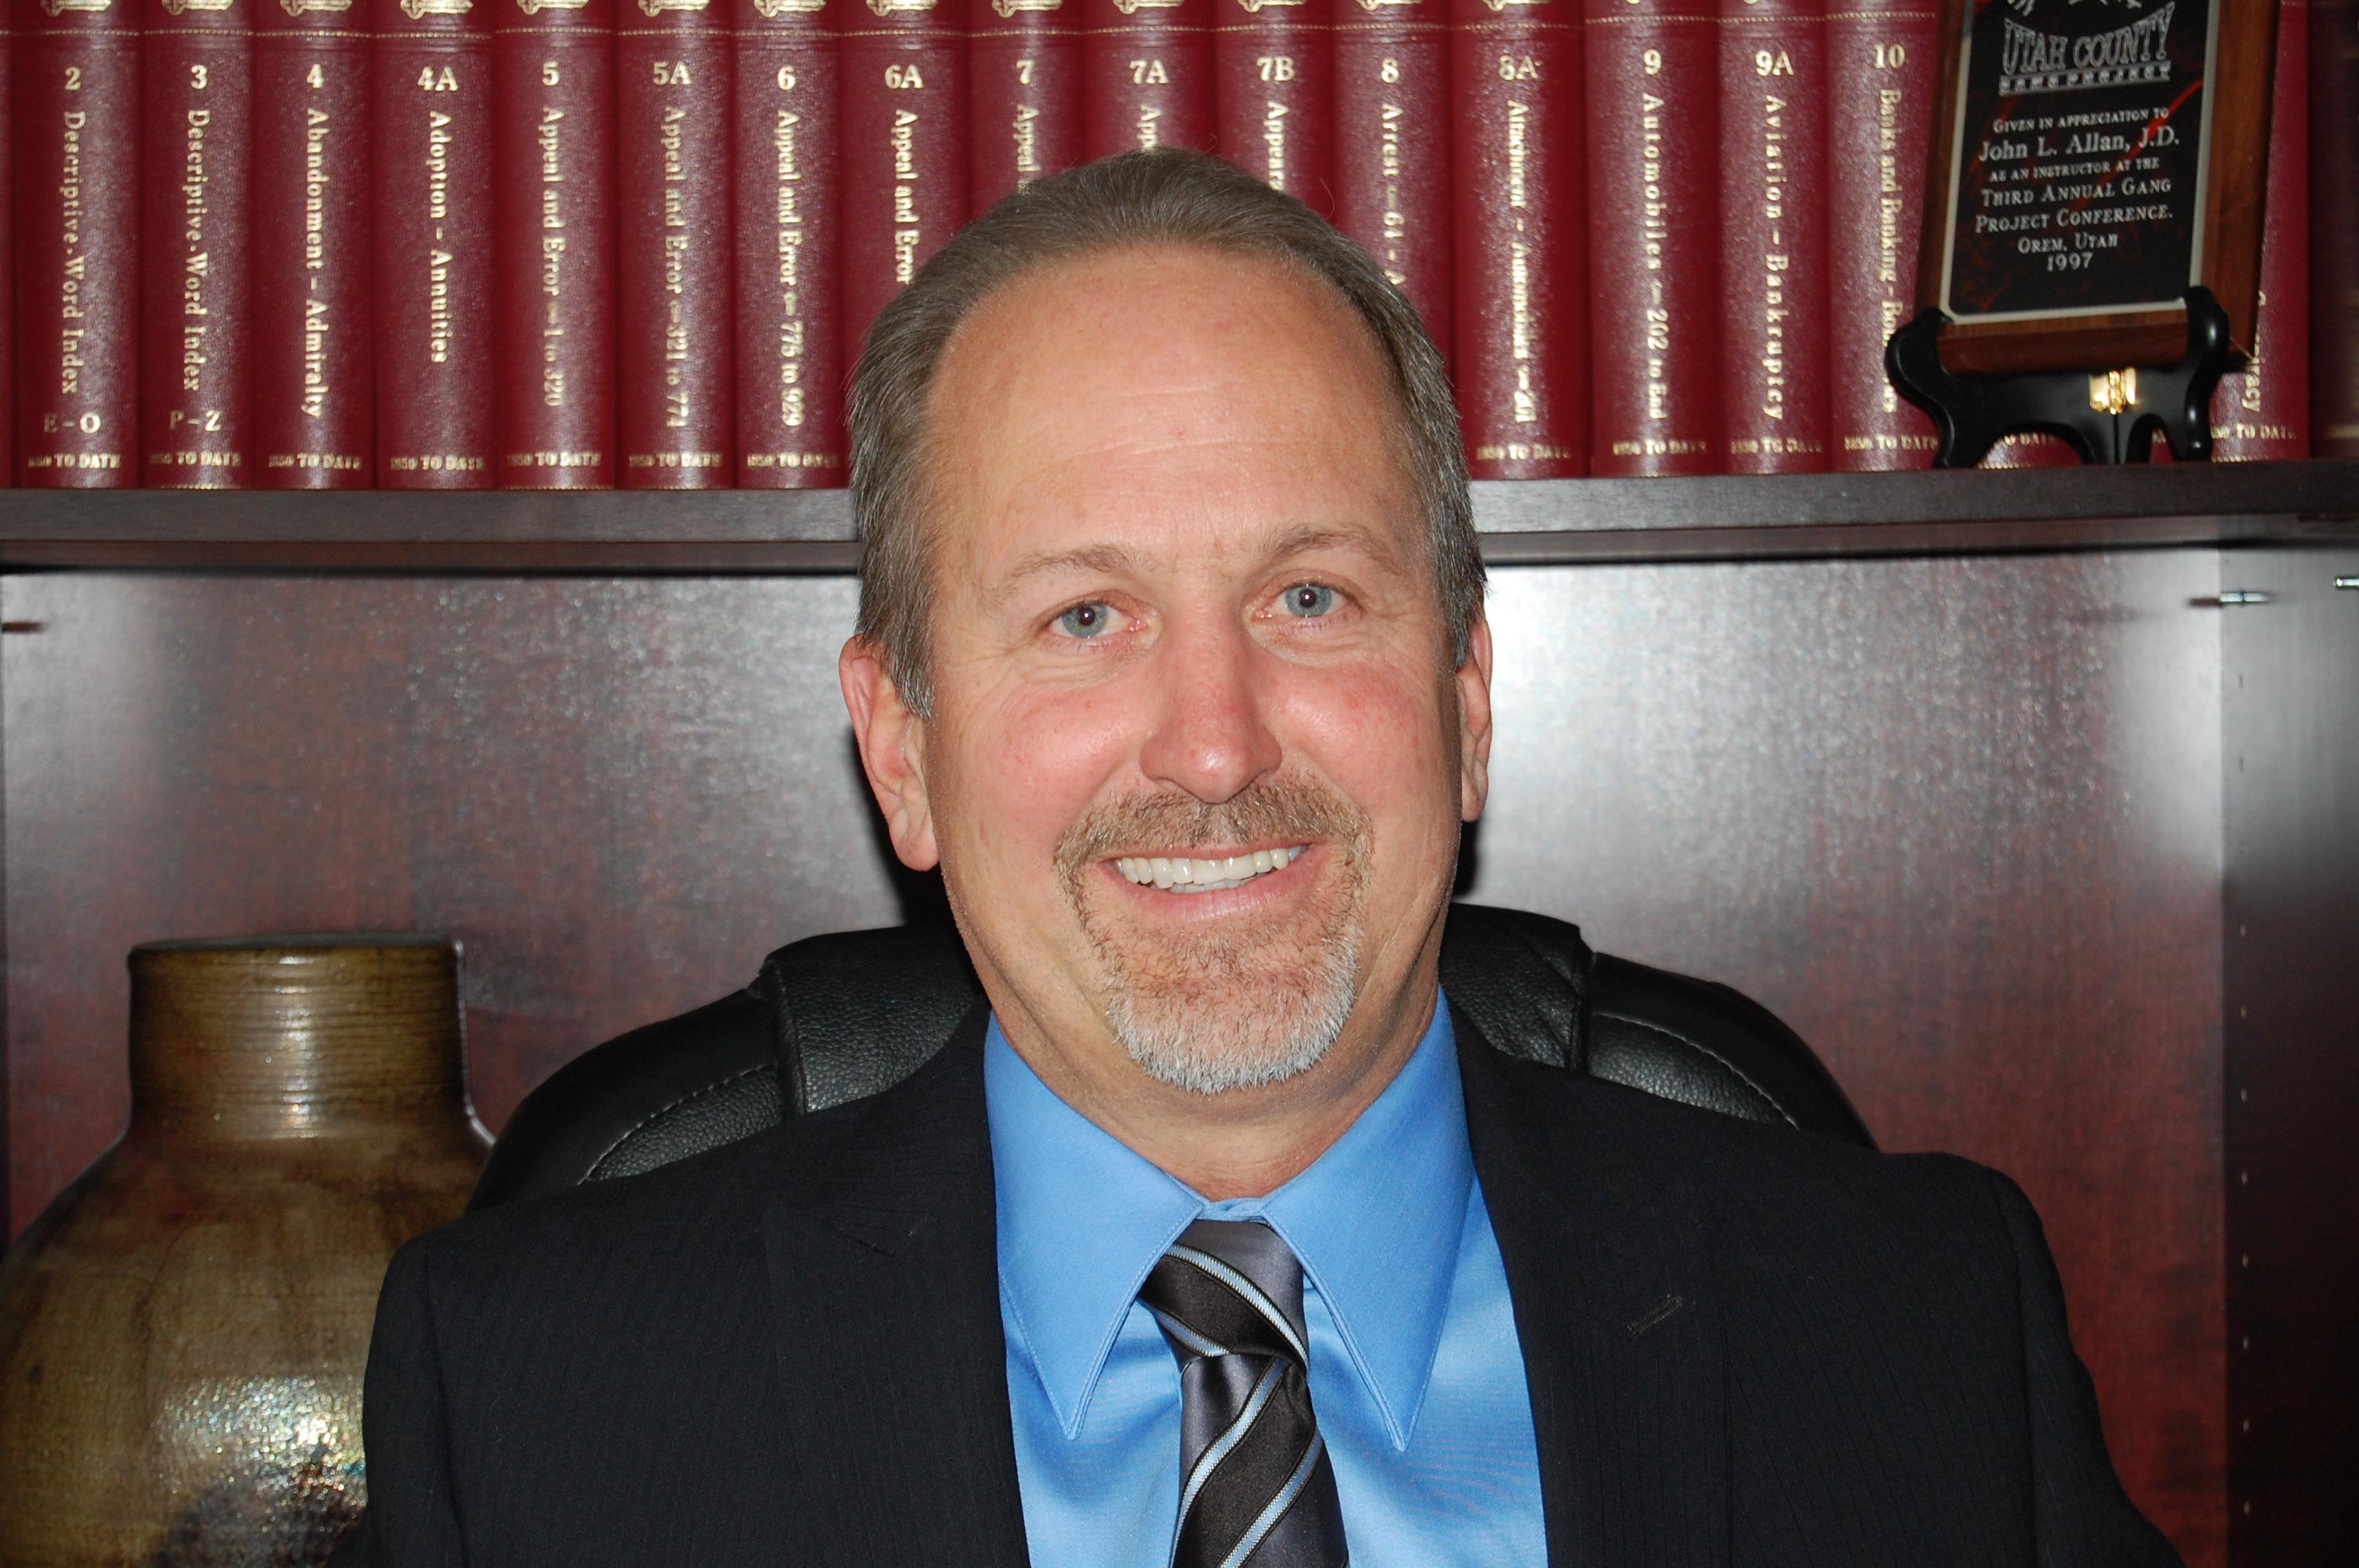 John Allan, criminal defense, BYU Groper